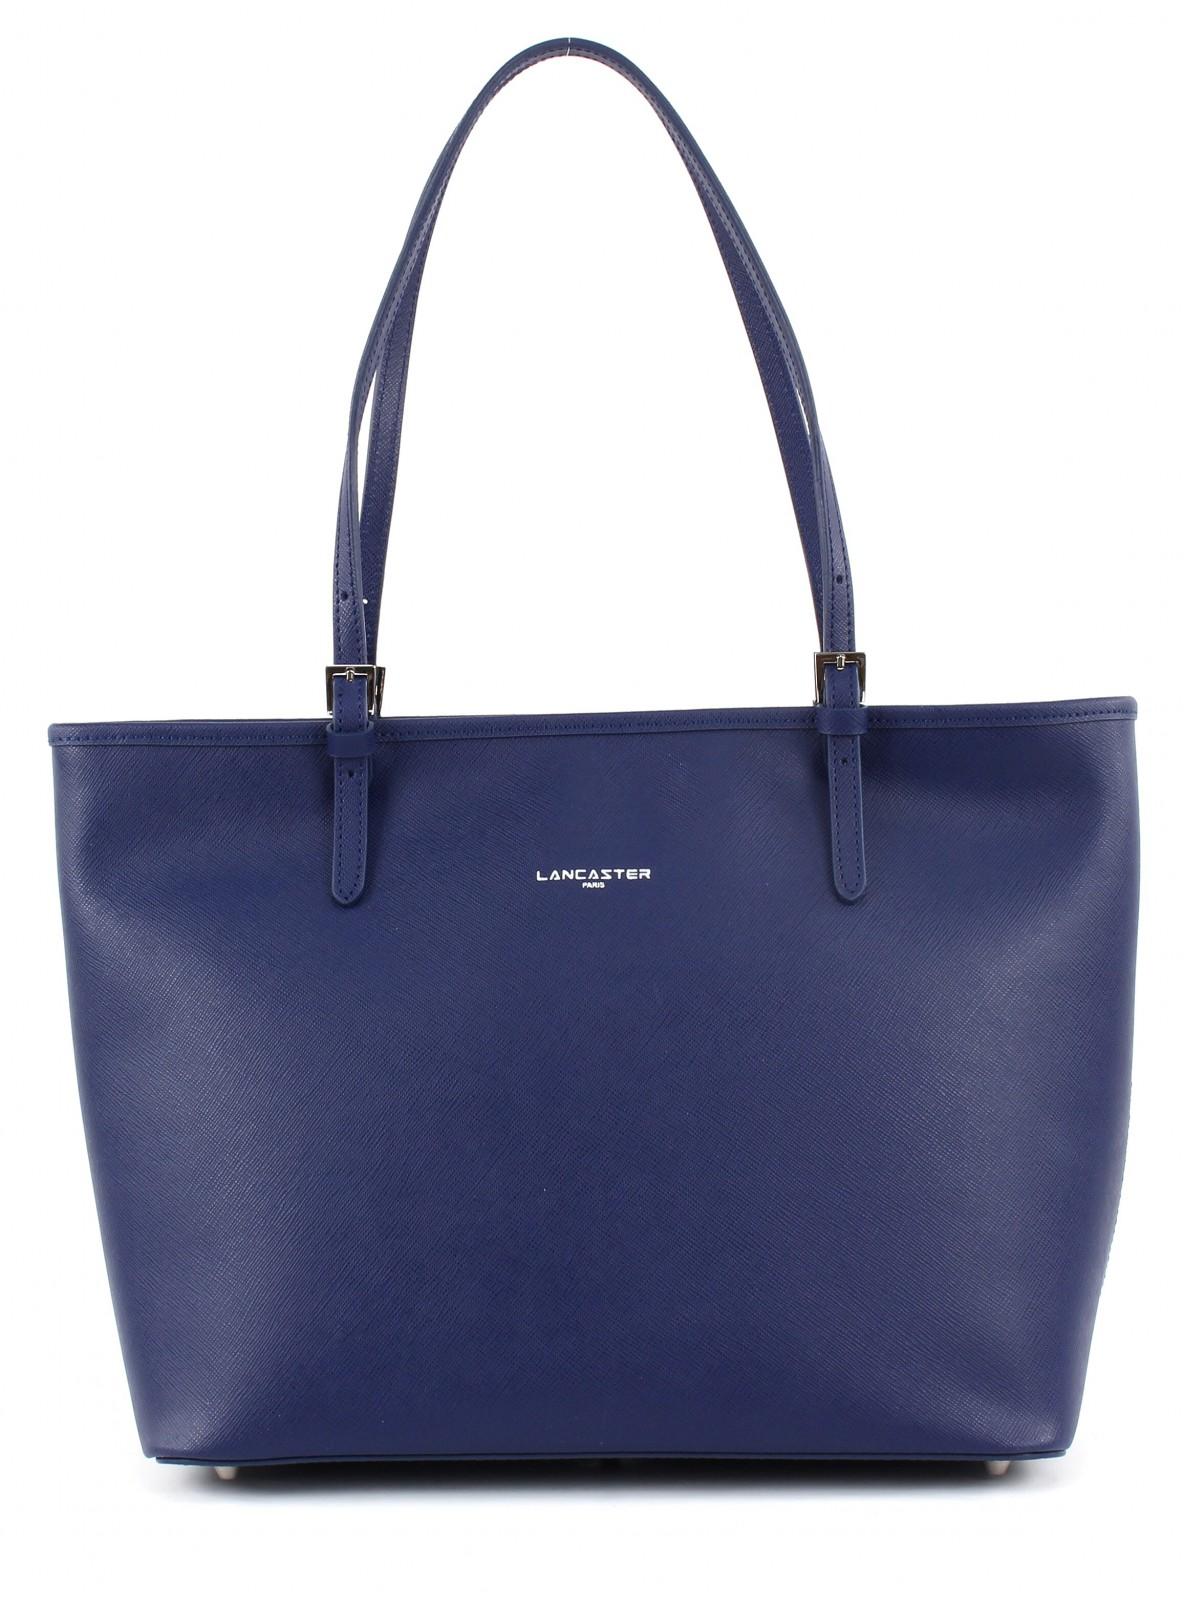 LANCASTER Adèle Shopper Bleu Fonce